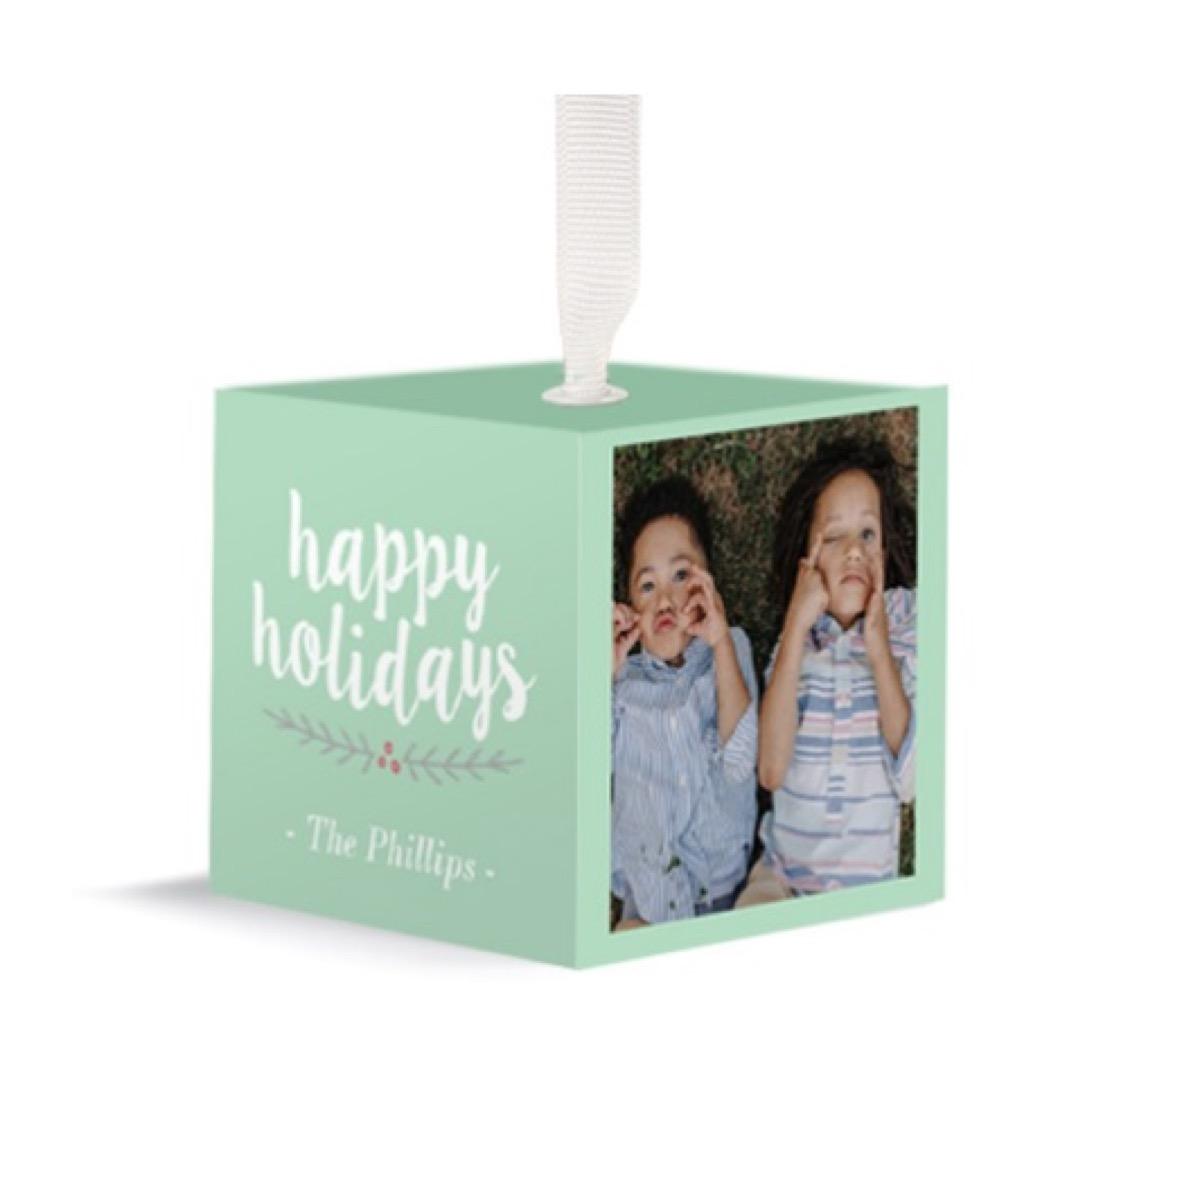 green photo cube ornament